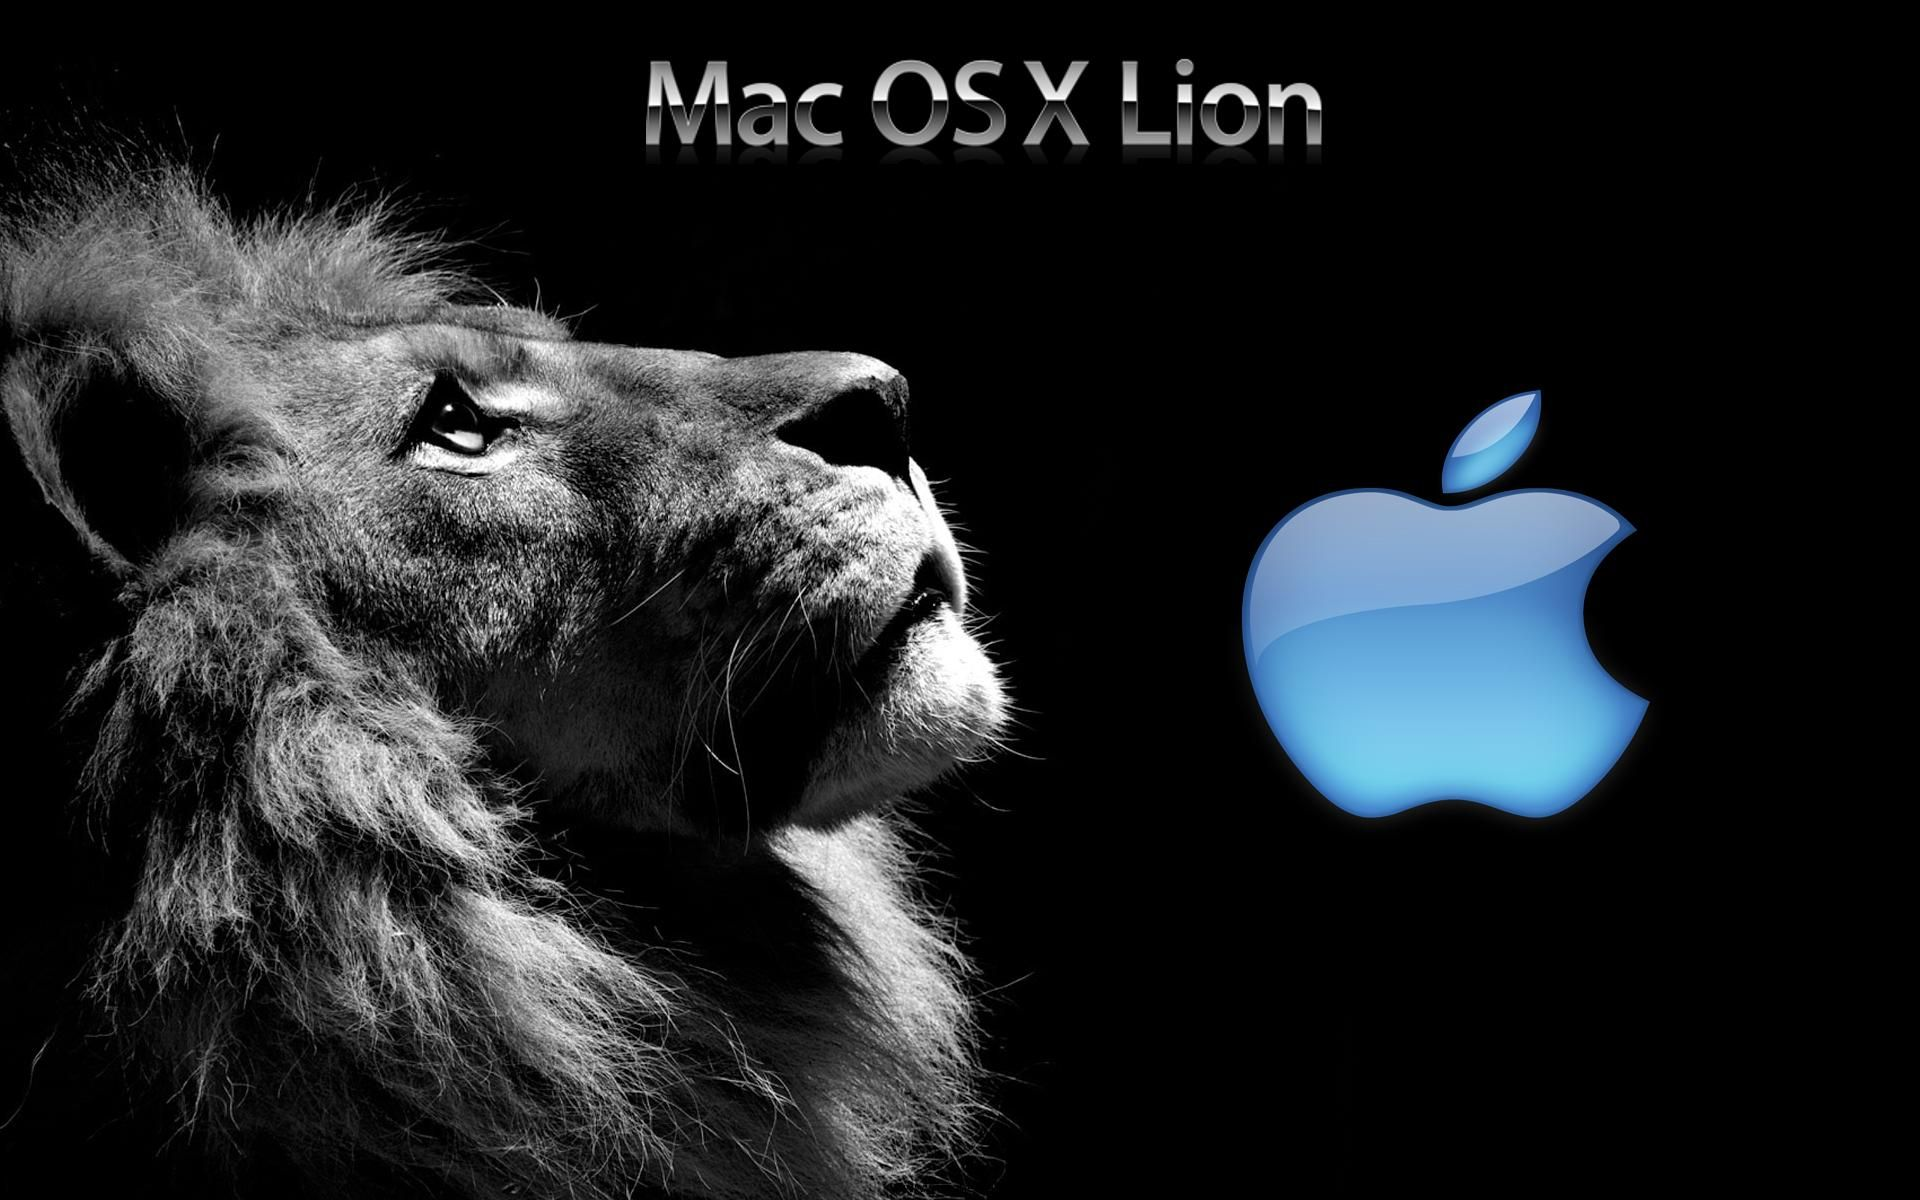 Amazing Wallpaper Mac Lion - c93614c7d7487c9fb938d64e81880e80  2018_477454.jpg